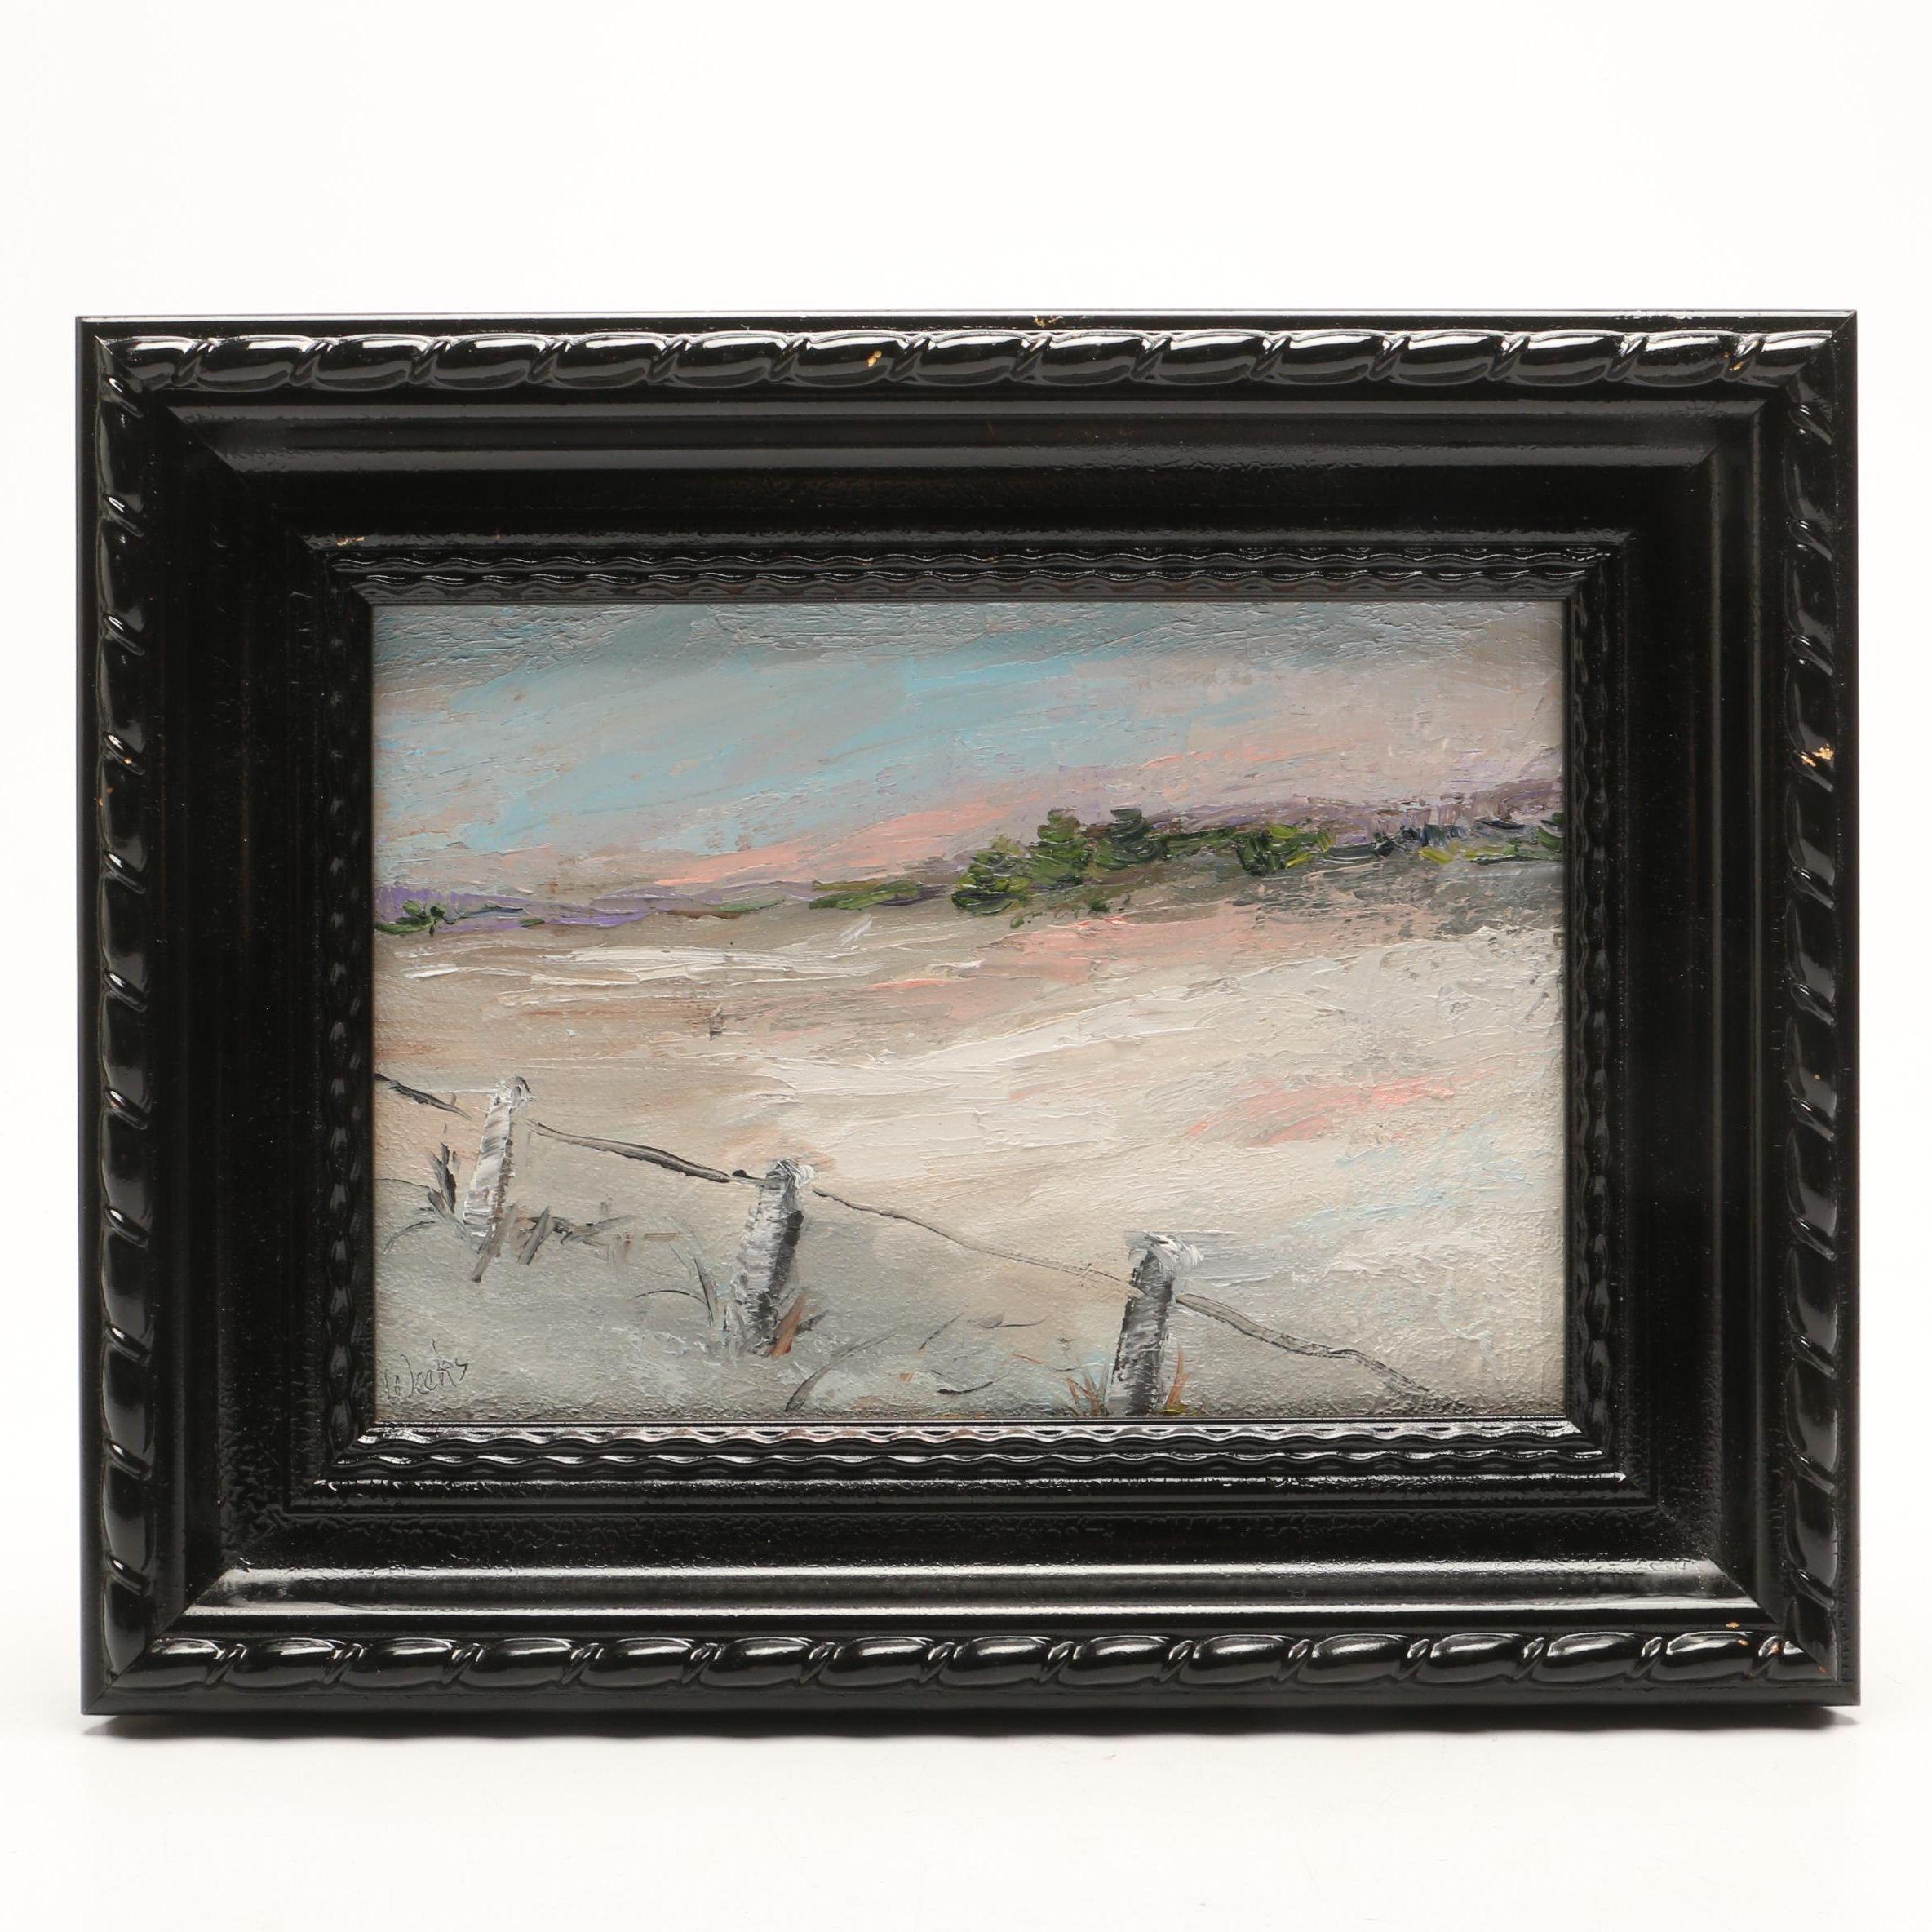 Trish Weeks Expressionist Style Oil Painting of Coastal Landscape